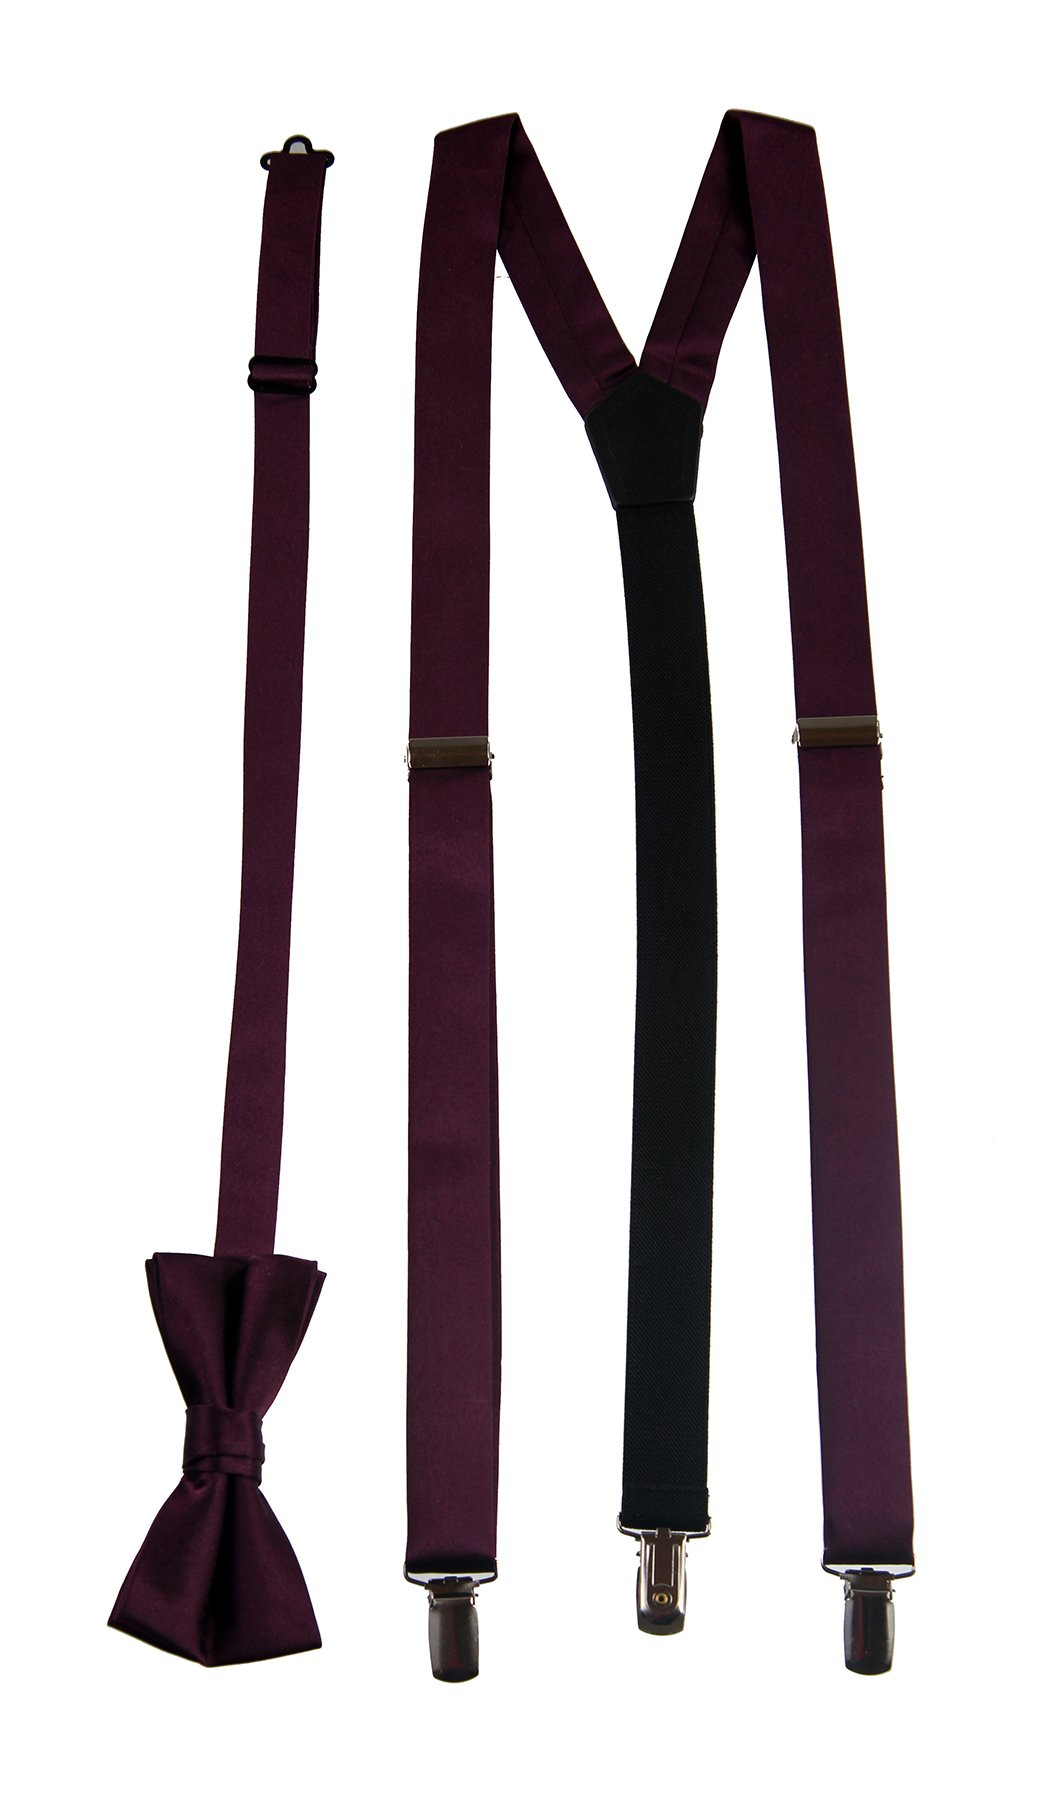 Satin Suspender and Bow Tie Set Combo in Men's & Kids Sizes (Boys 34, Plum)